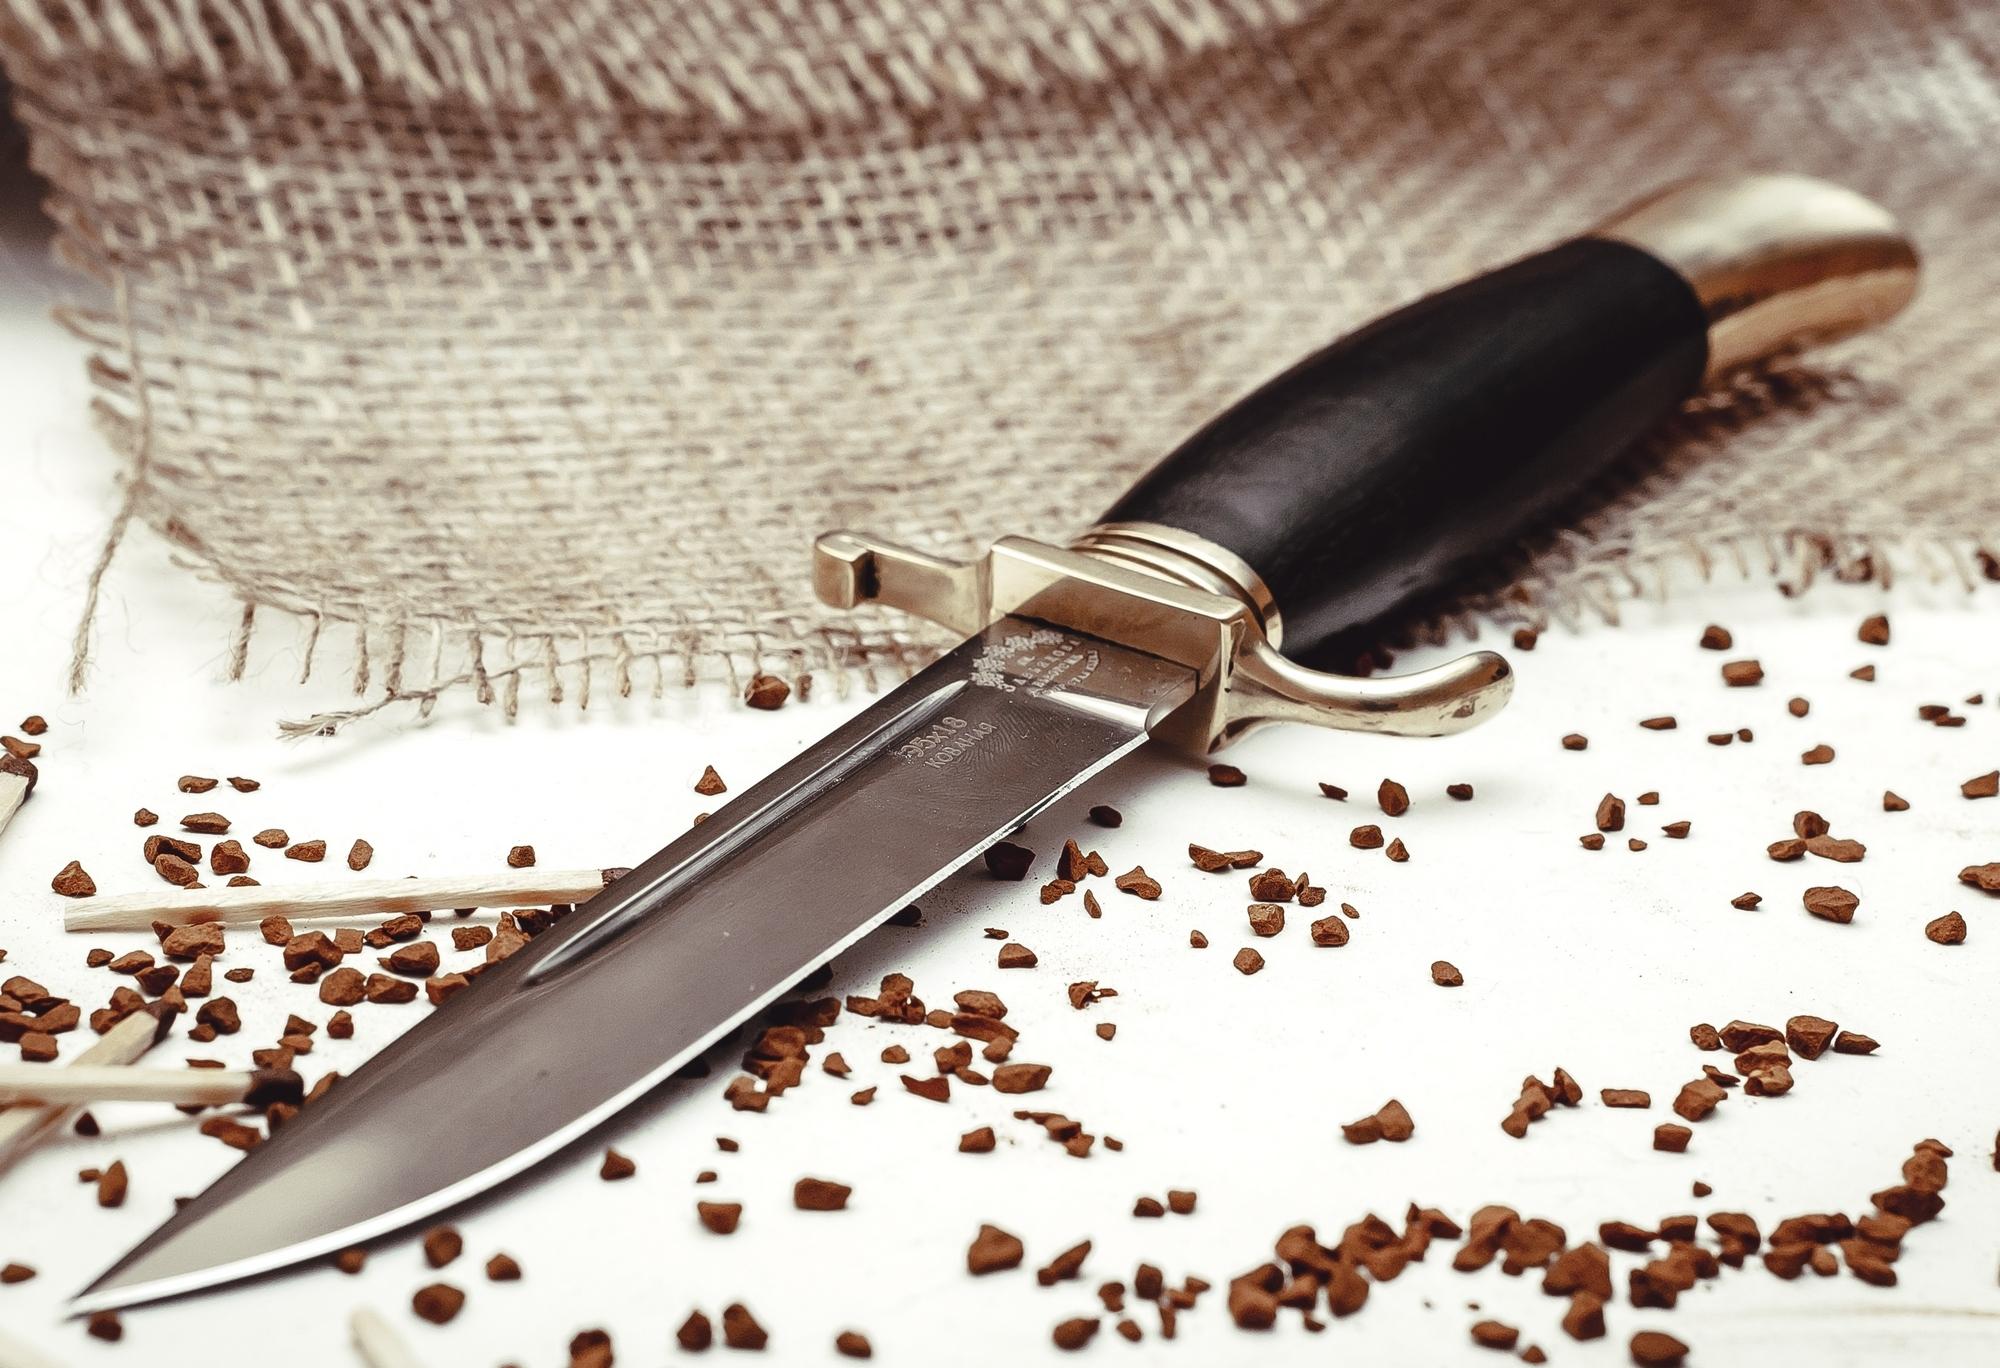 Фото 6 - Нож Финка НКВД, ков. 95х18, латунь от Кузница Завьялова